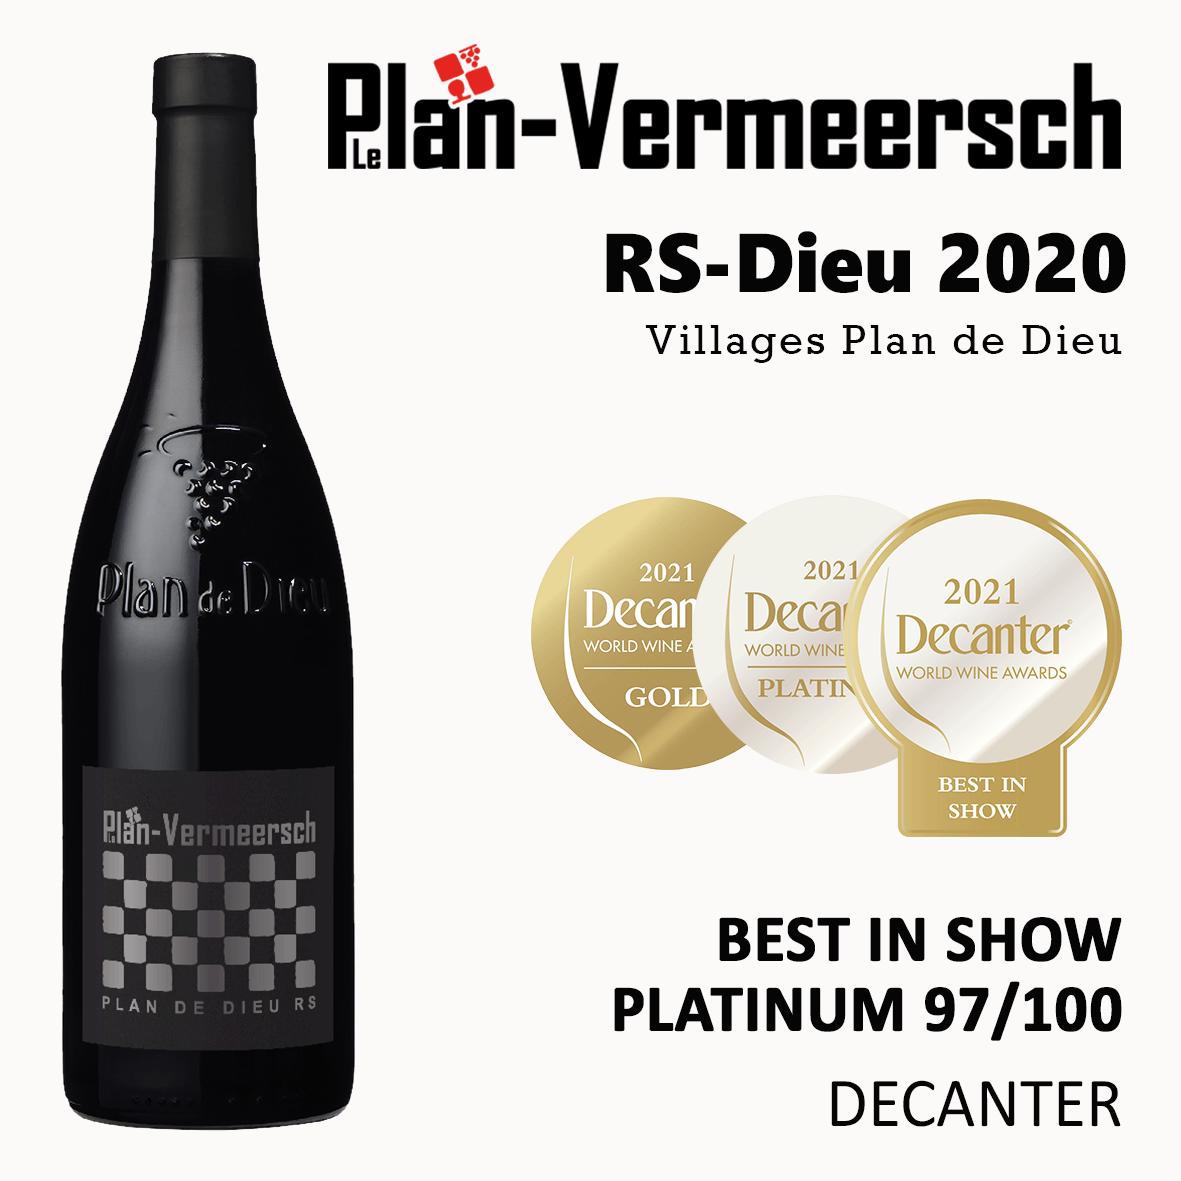 Bottle wine RS-Dieu blend Grenache, Syrah ,Mourvedre LePlan-Vermeersch